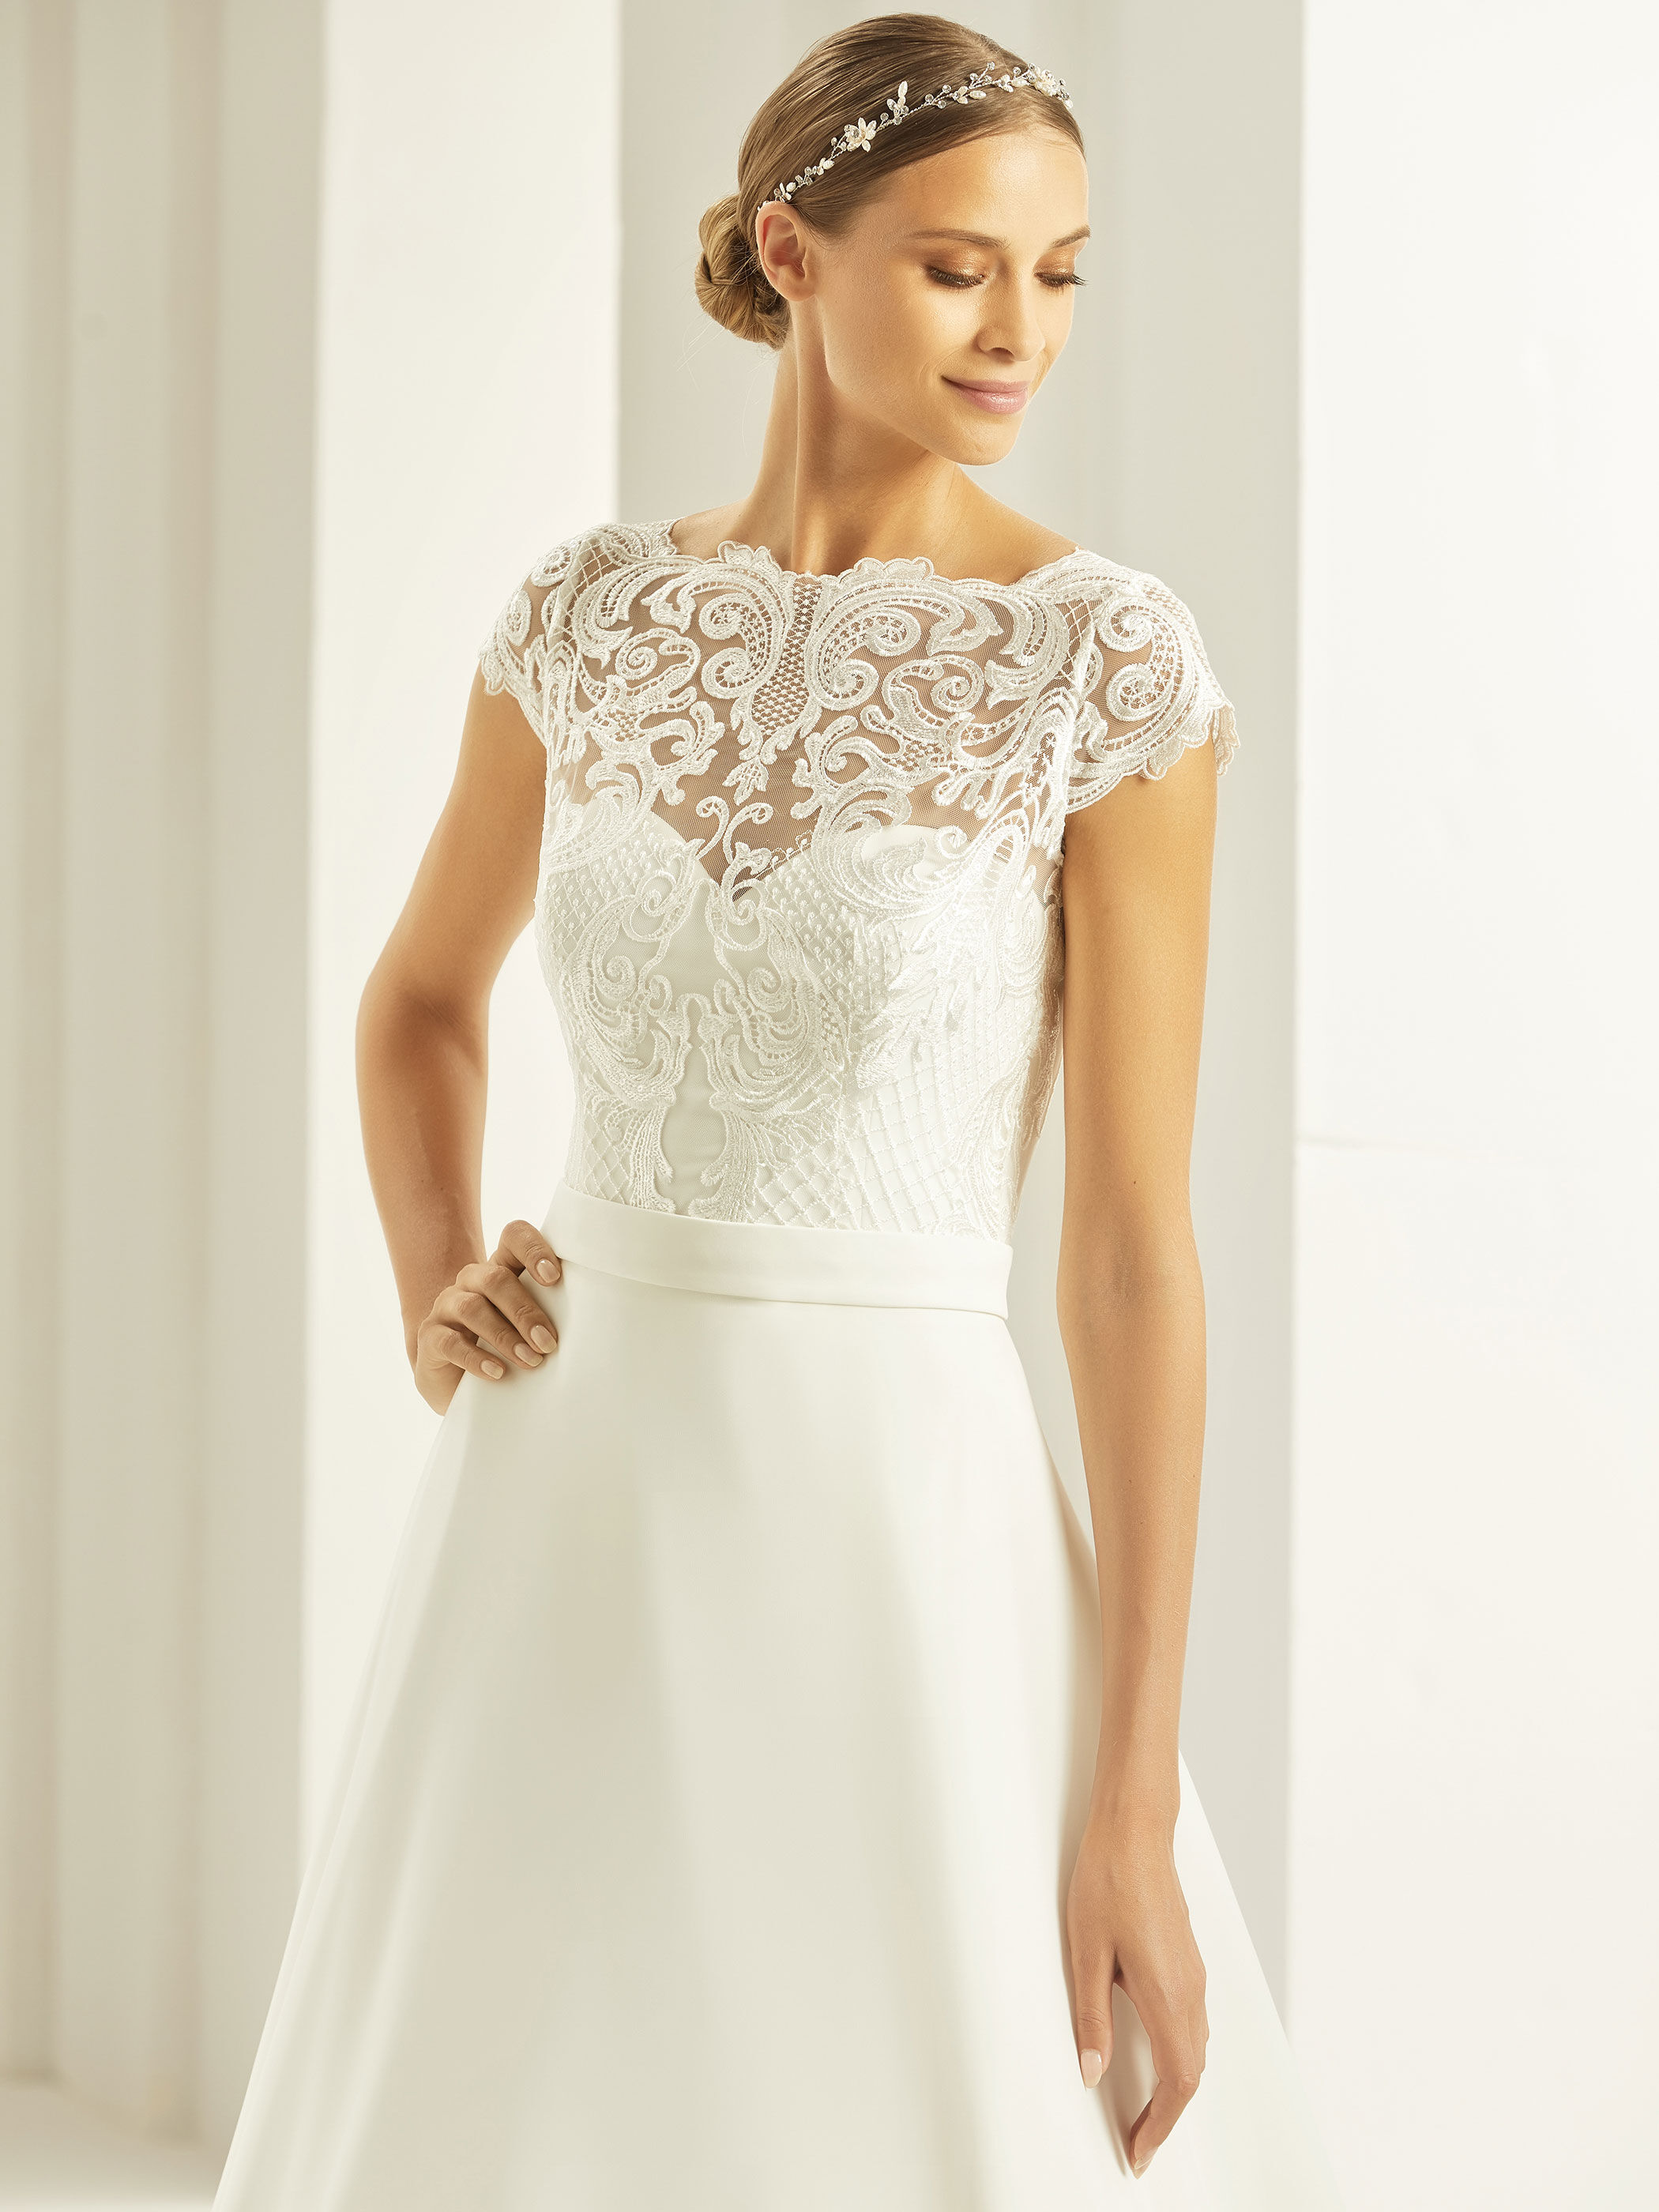 bianco-evento-bridal-bolero-e269-_1__1.j